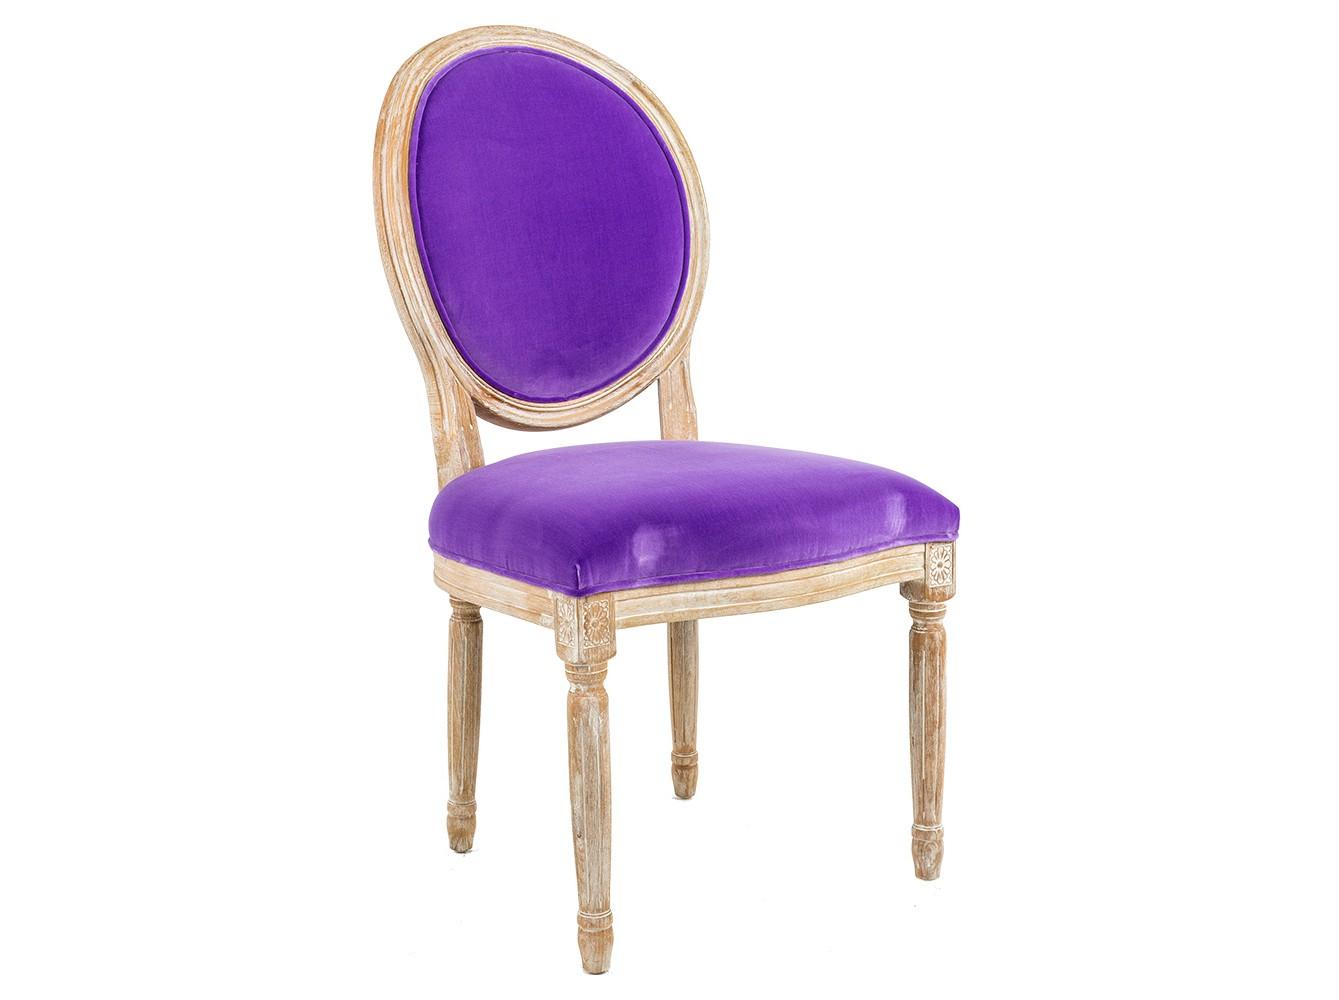 Кухонный стул Object Desire 15438279 от thefurnish